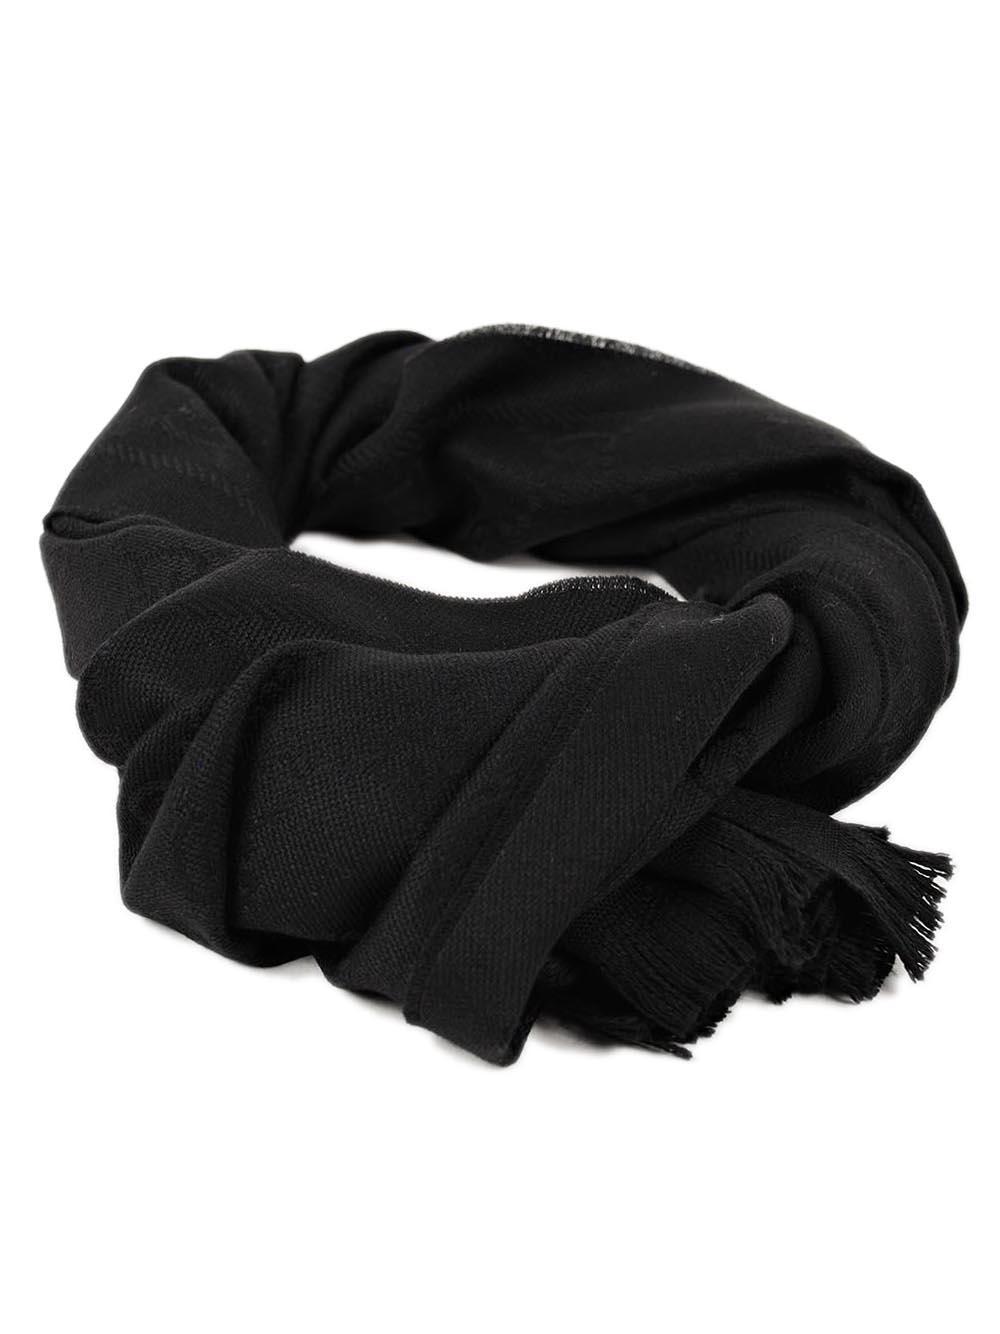 22a2b12b3d6 Lyst - Gucci Sten Scarf 48x180 in Black